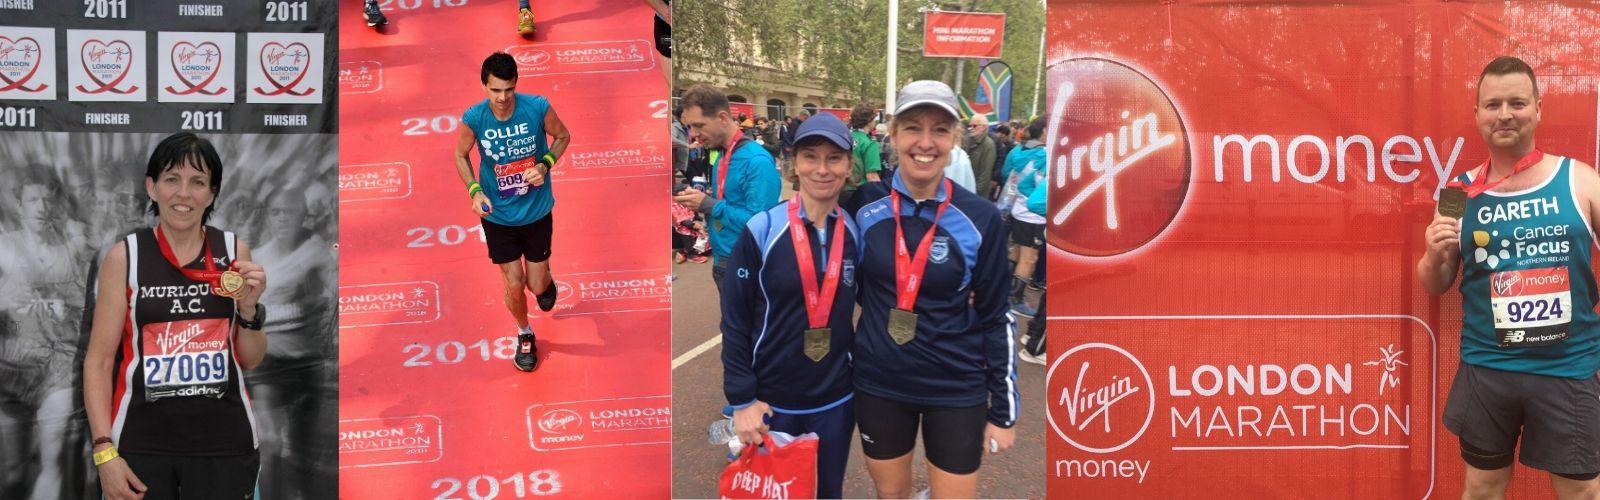 London Marathon – 25 April 2021